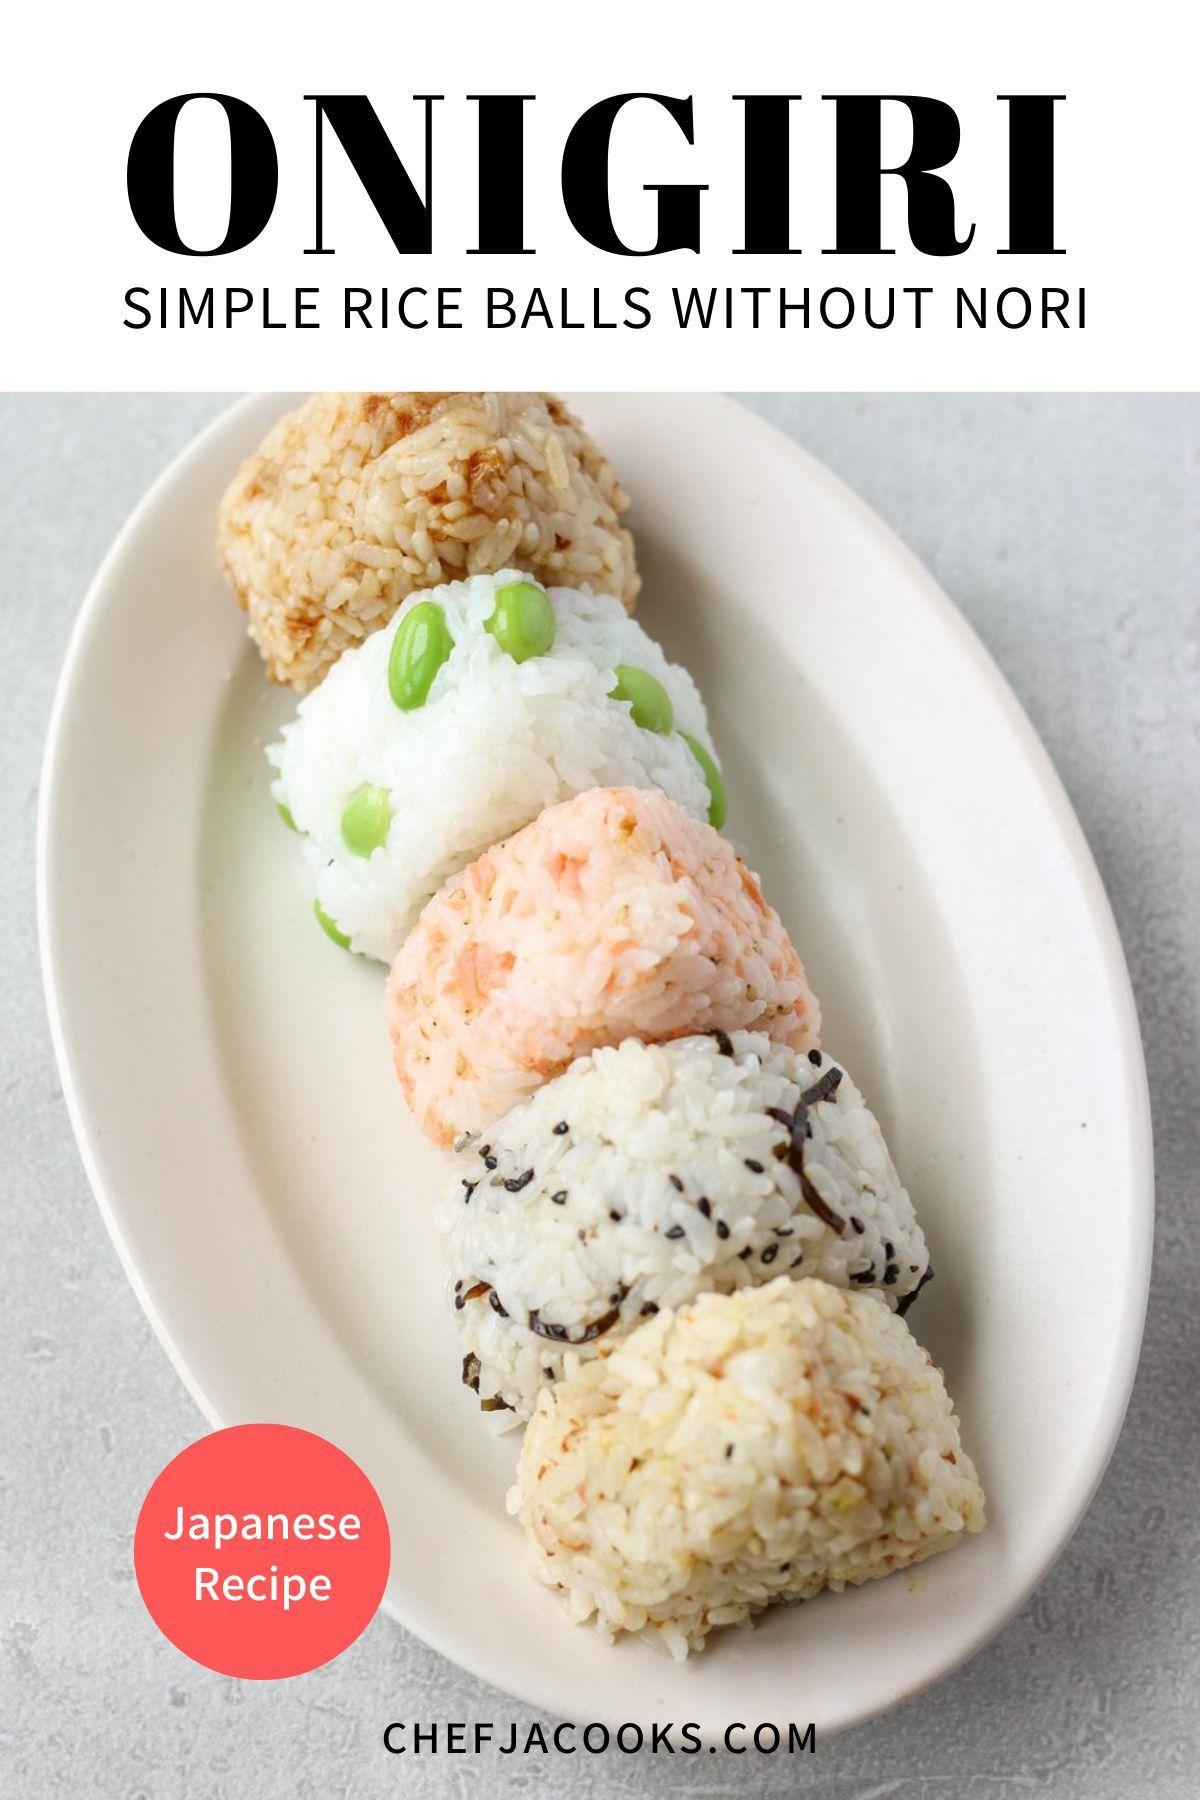 Simple Onigiri Rice Balls Without Nori Seaweed Chef Ja Cooks Recipe Healthy Dessert Recipes Healthy Japanese Recipes Onigiri